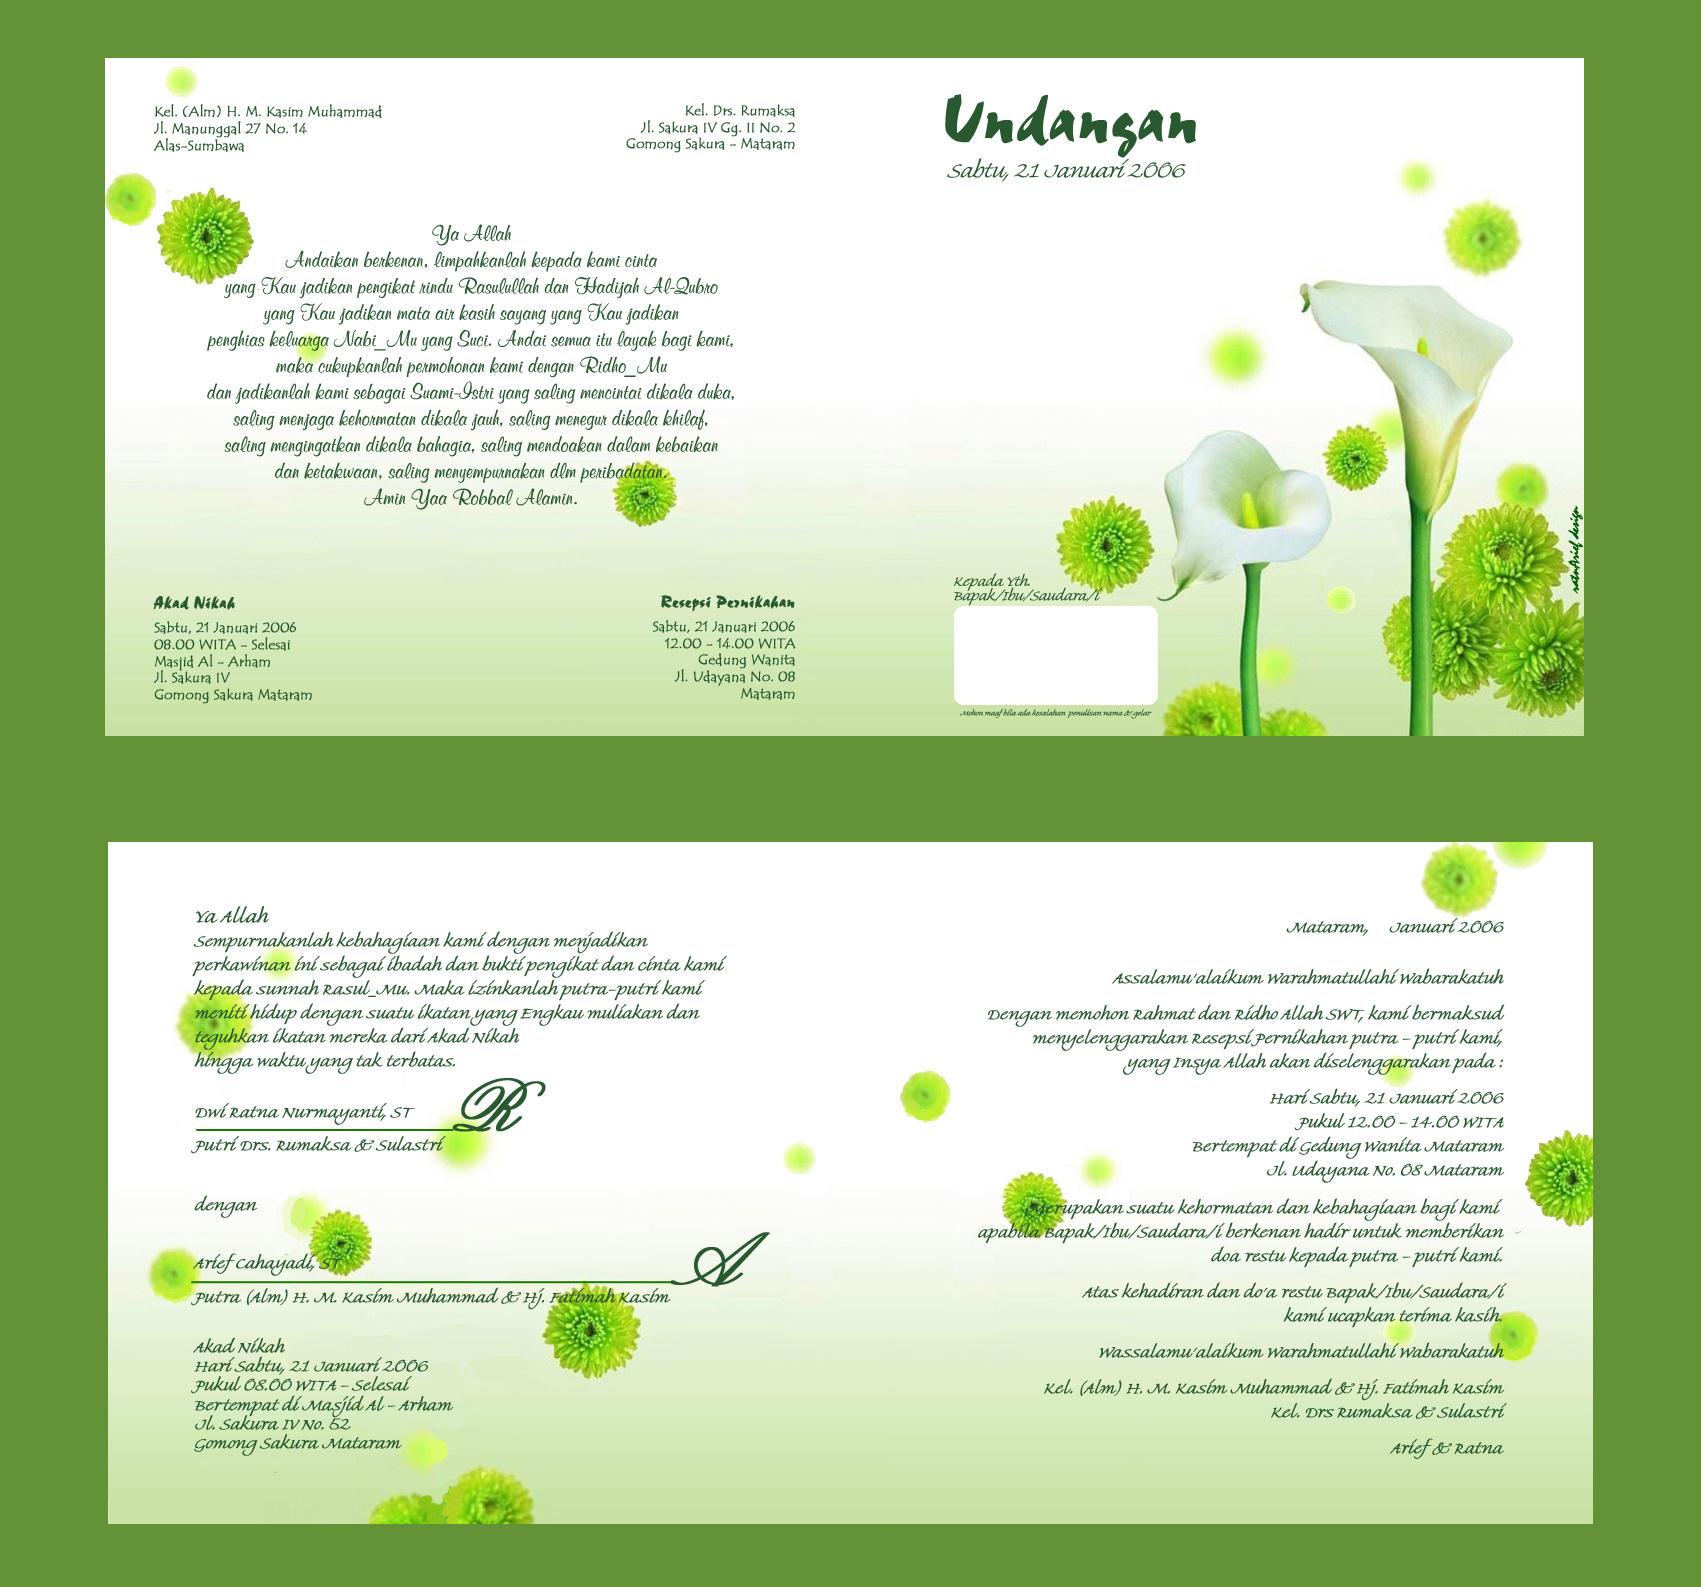 Invitation Card Design by faeriegothmother on DeviantArt – An Invitation Card